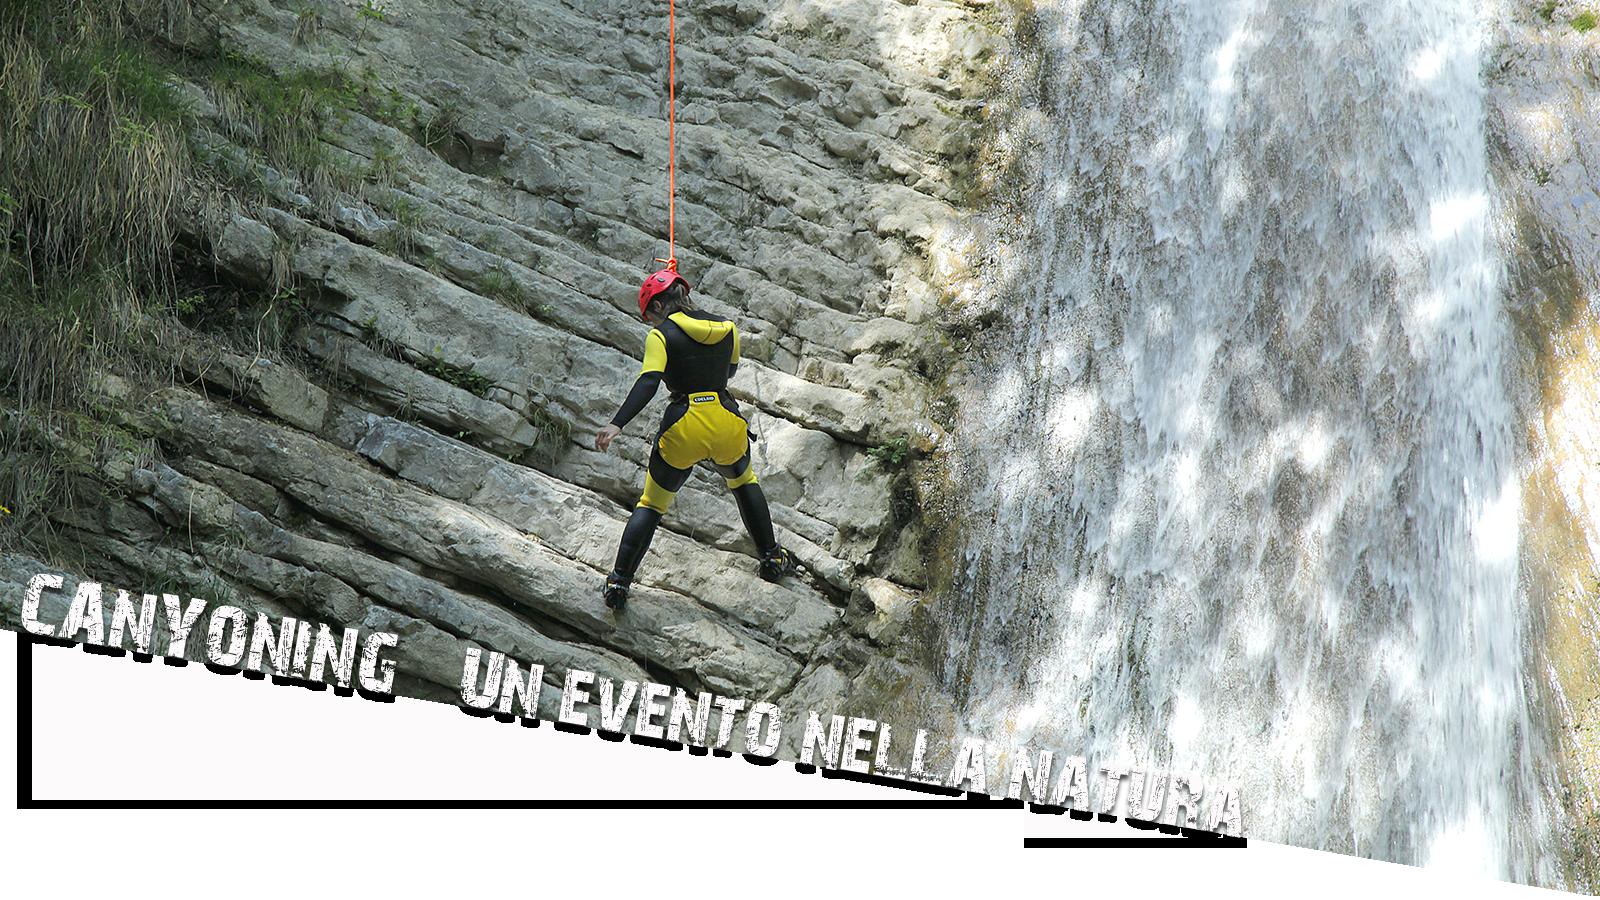 Canyoning Gardasee abseilen titelbild